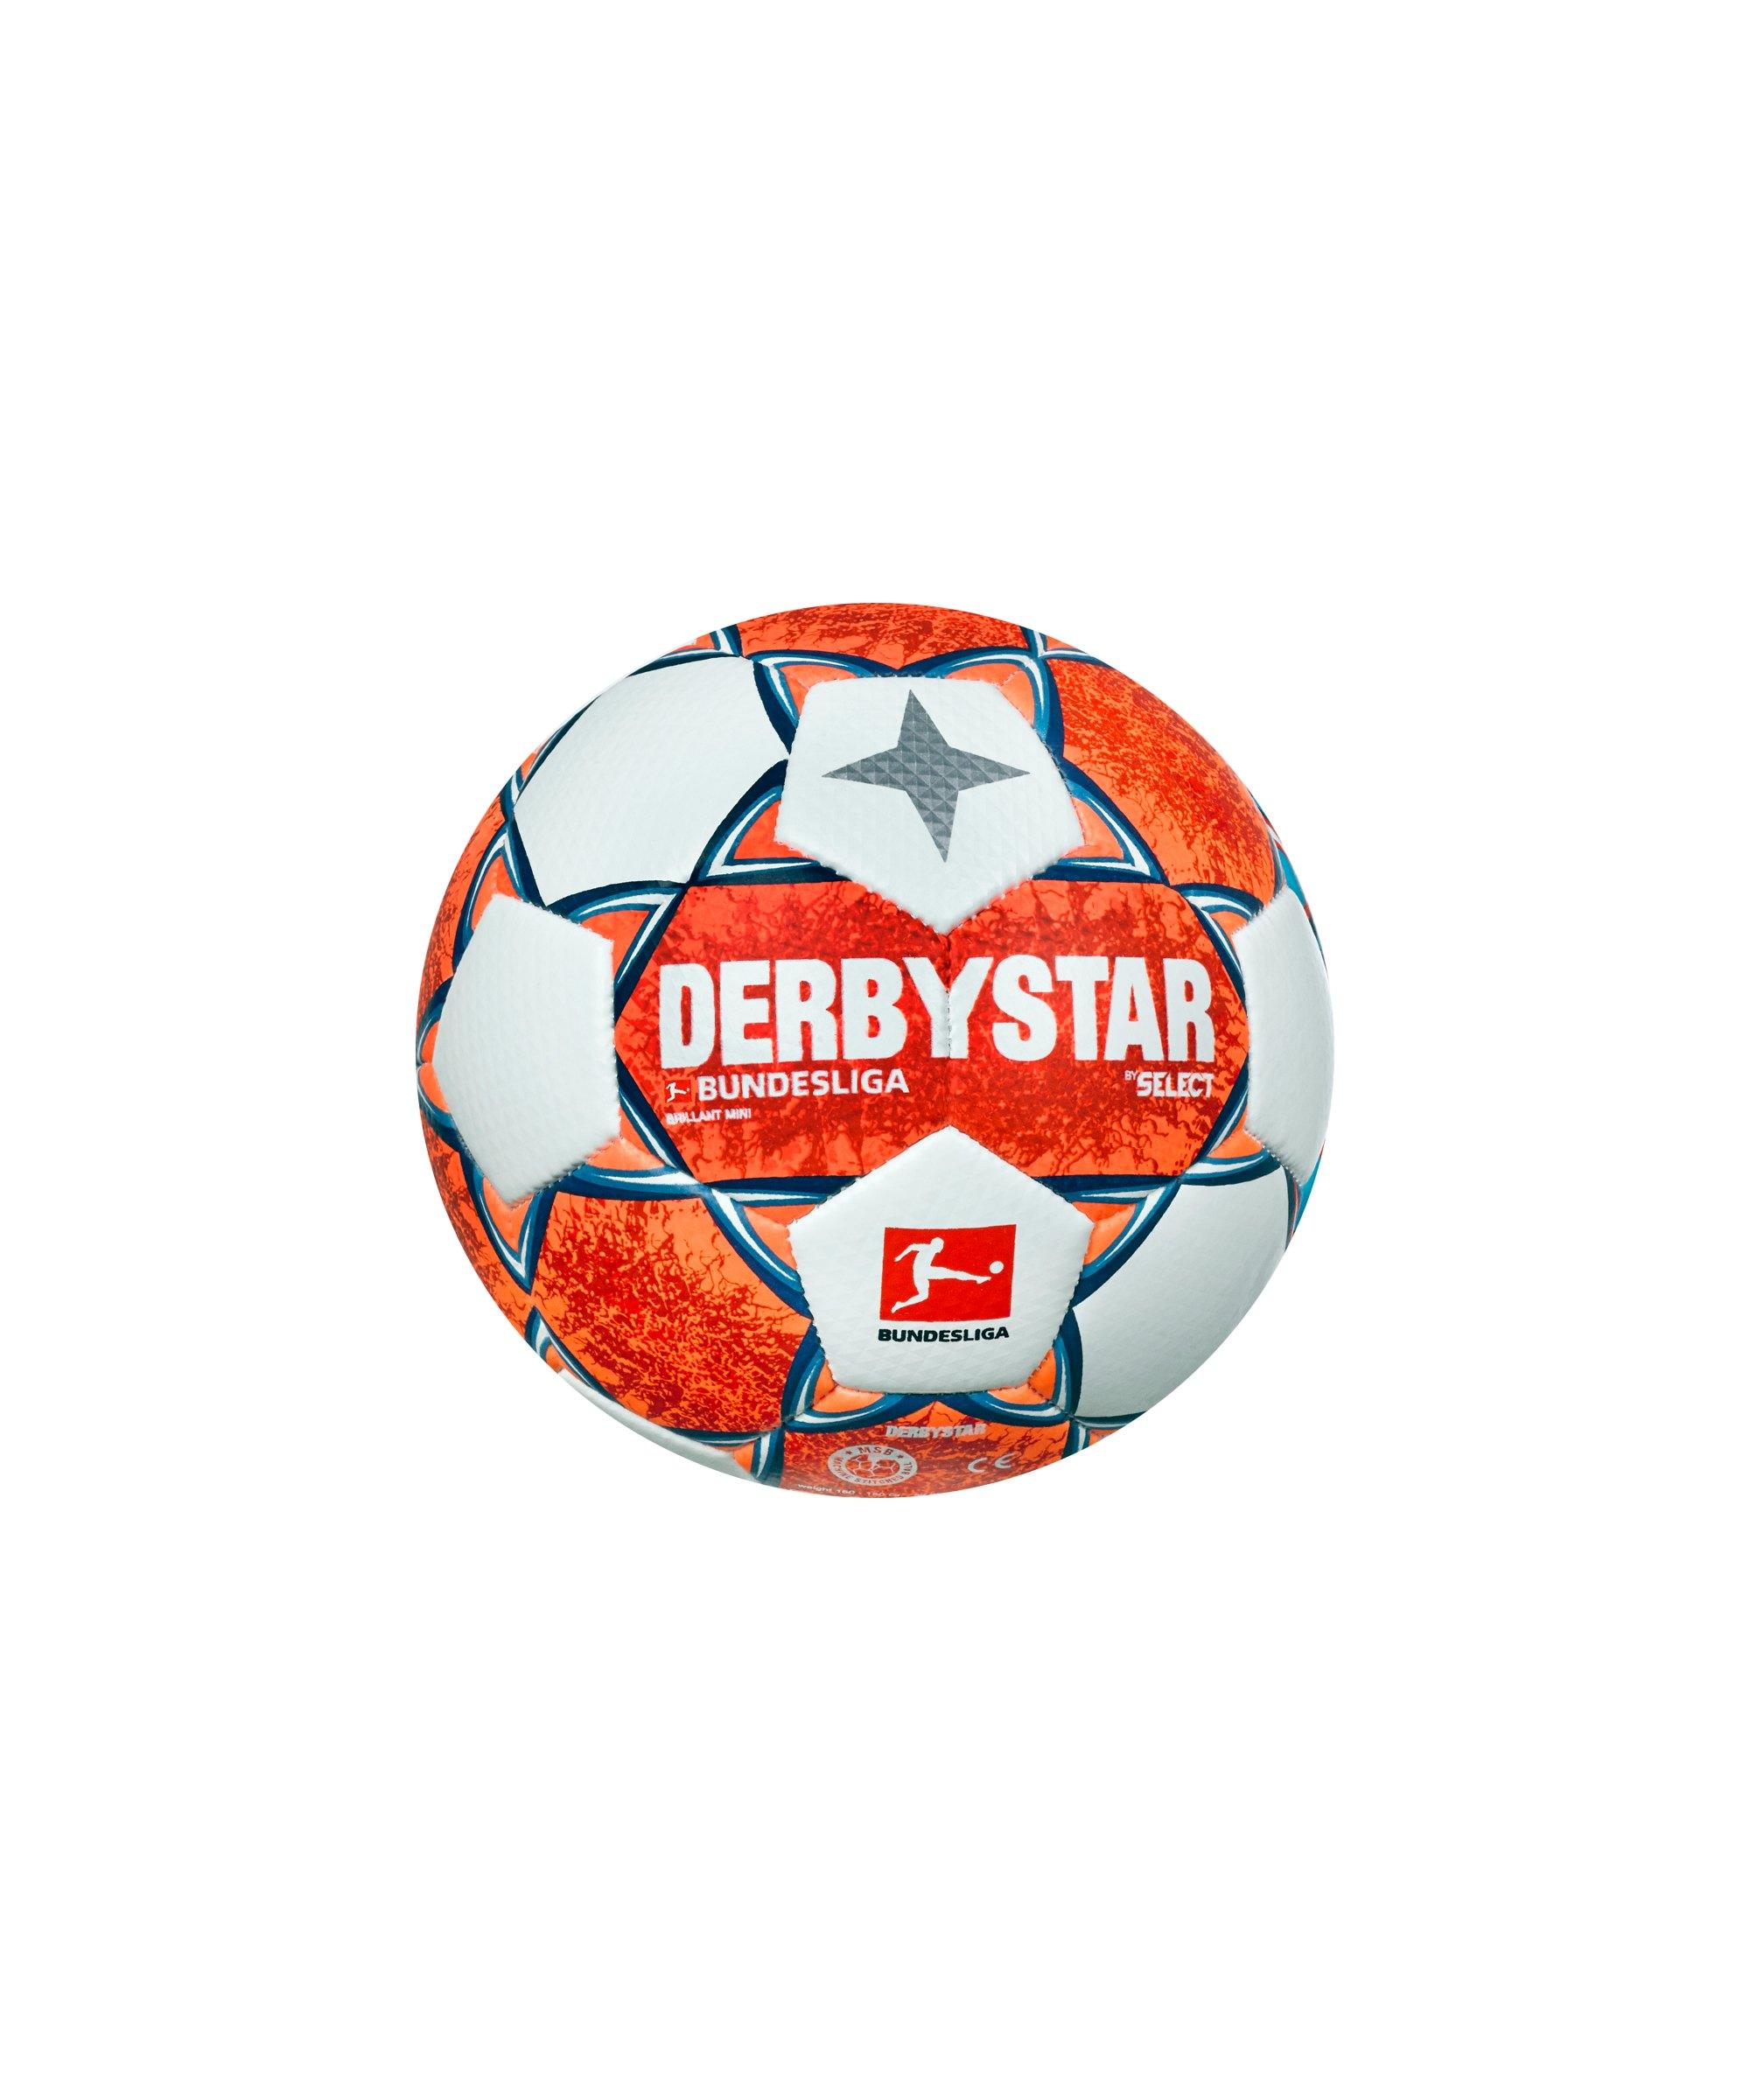 Derbystar Bundesliga Brillant Mini v21 Trainingsball 2021/2022 Orange Blau F021 - orange